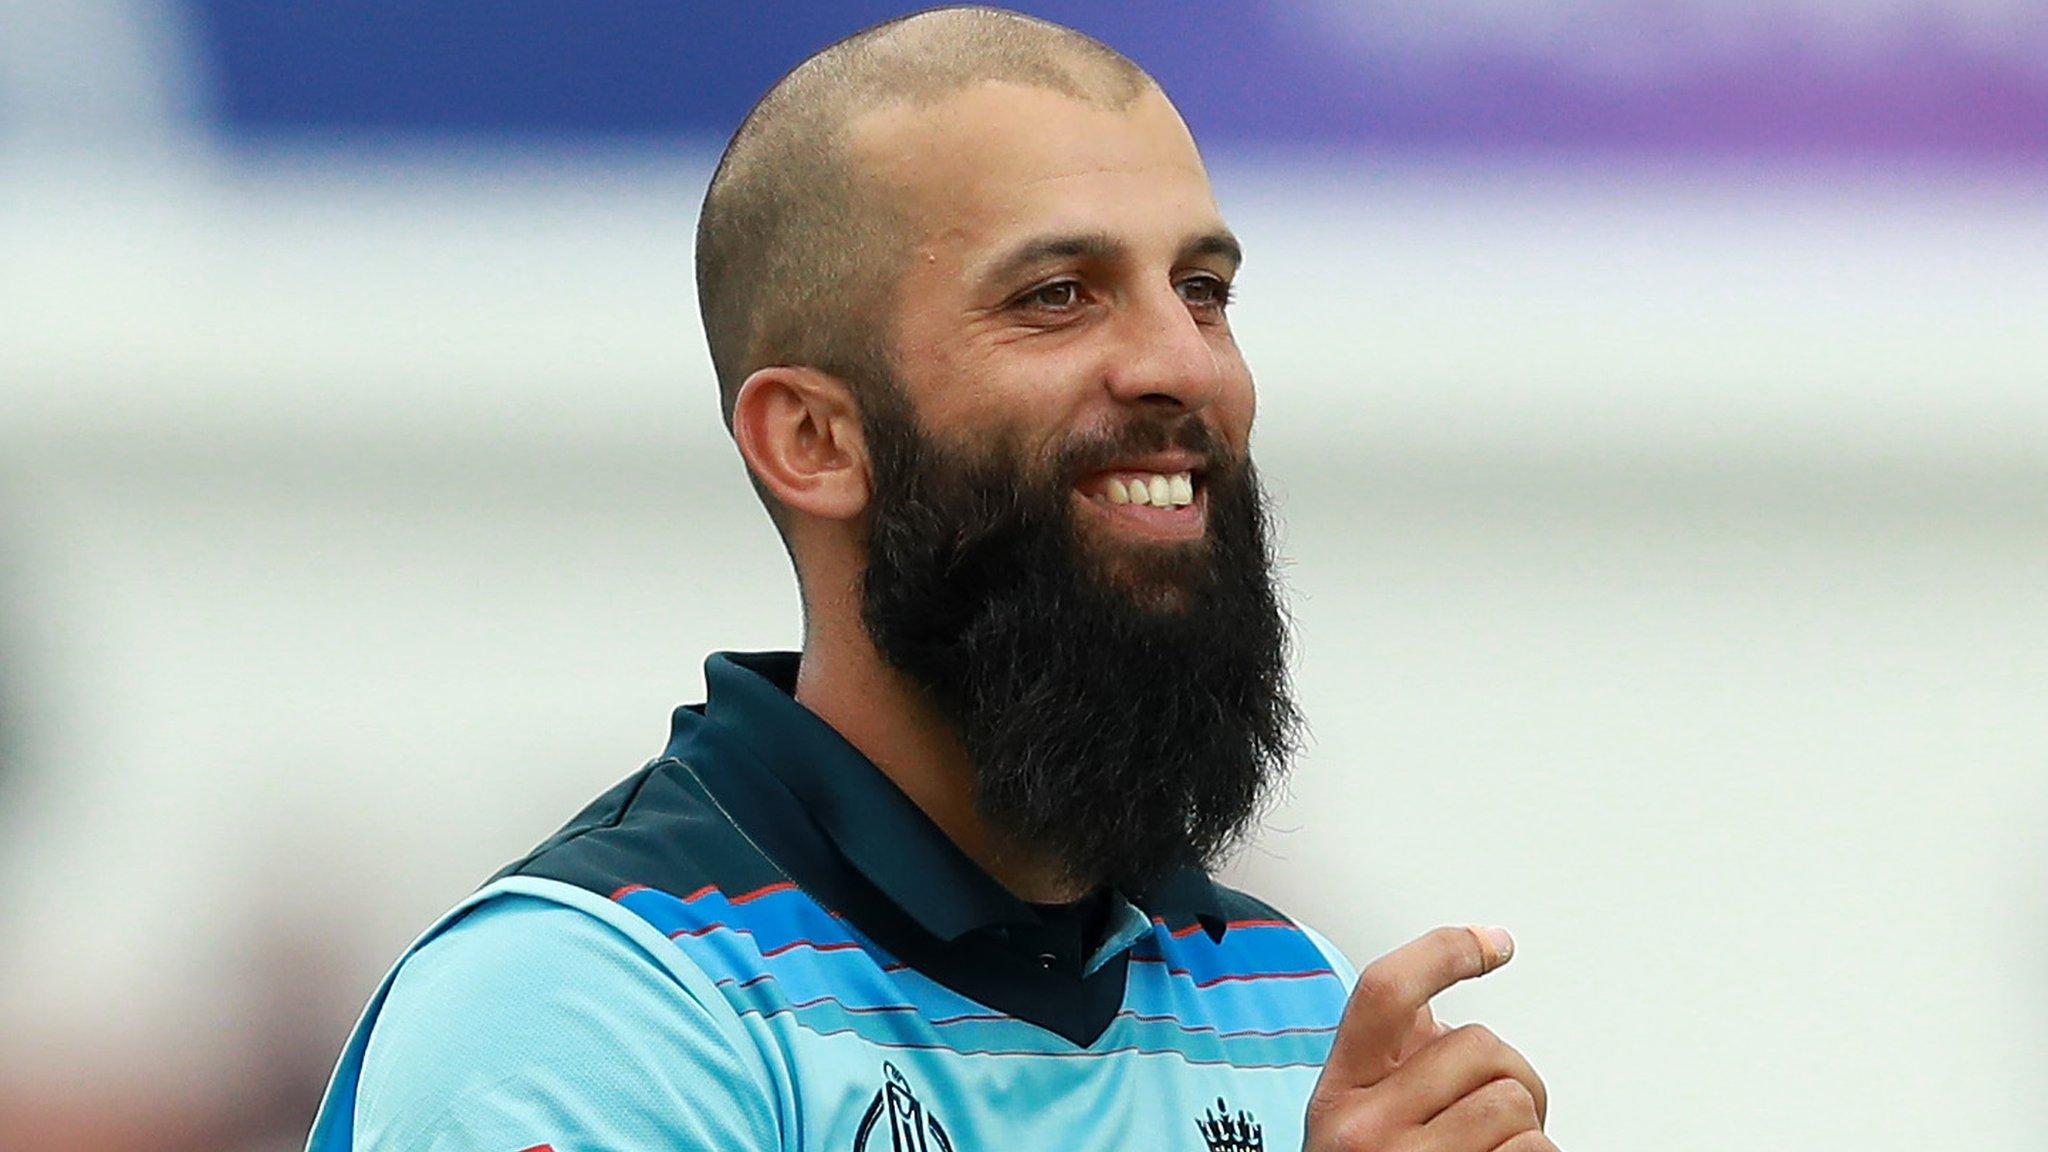 Cricket World Cup: England's Moeen Ali on Sri Lanka match